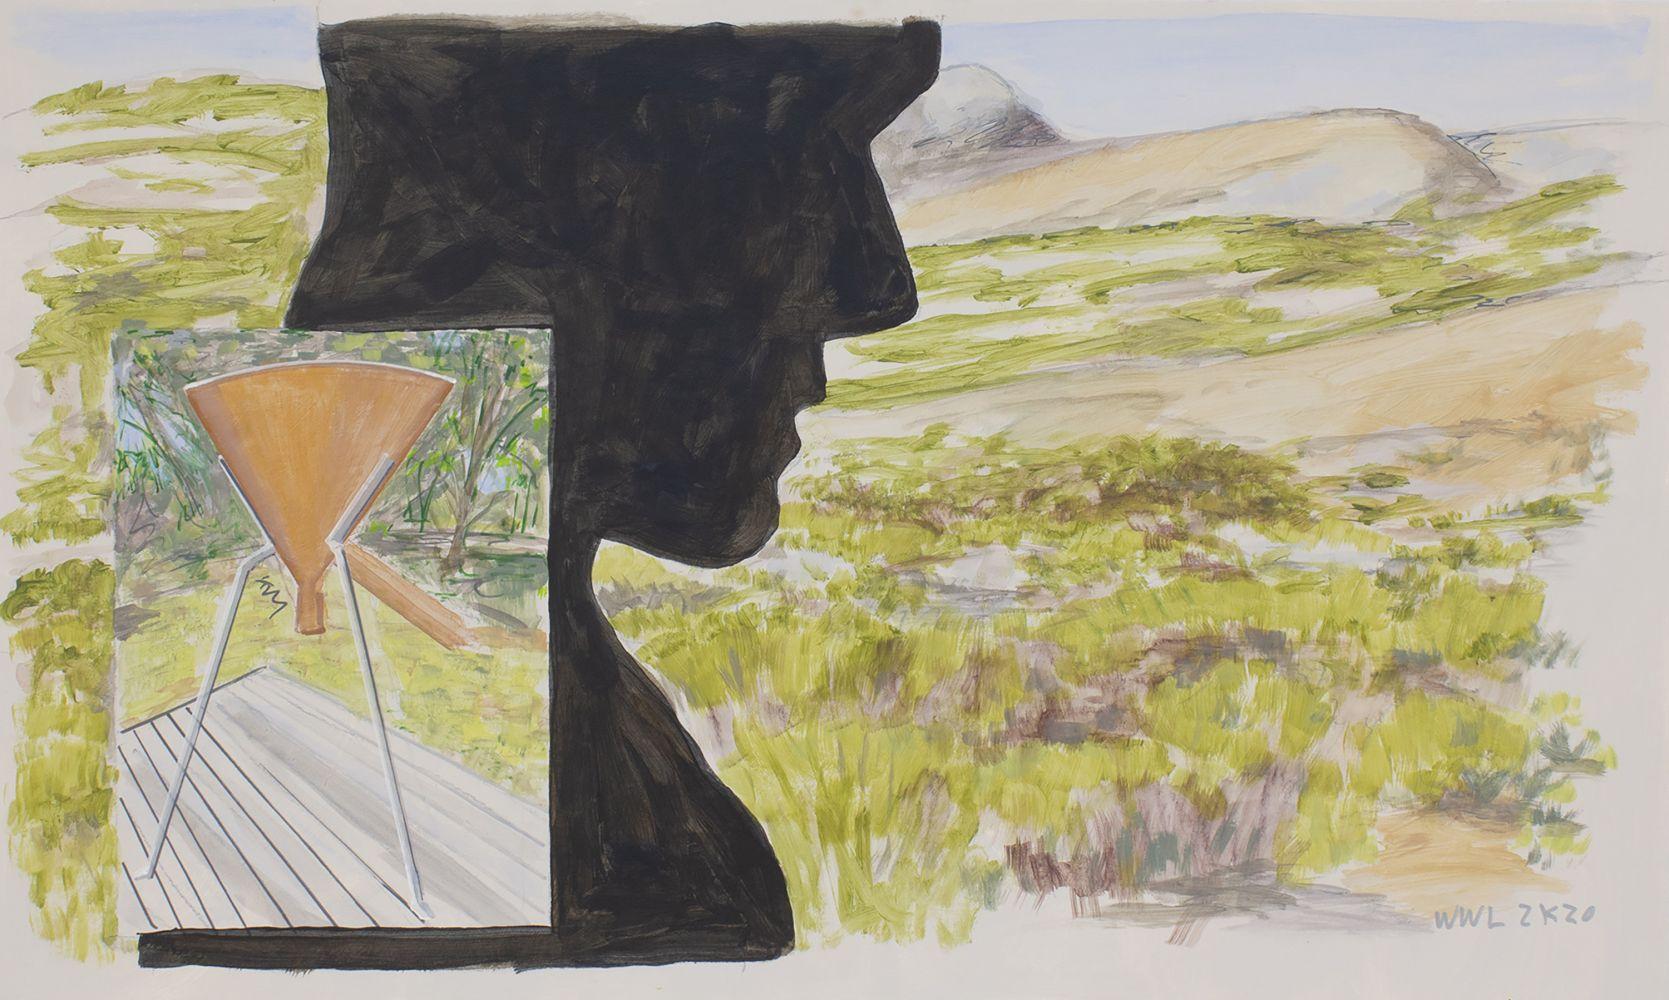 William Leavitt, Copper still, silhouette, 2020